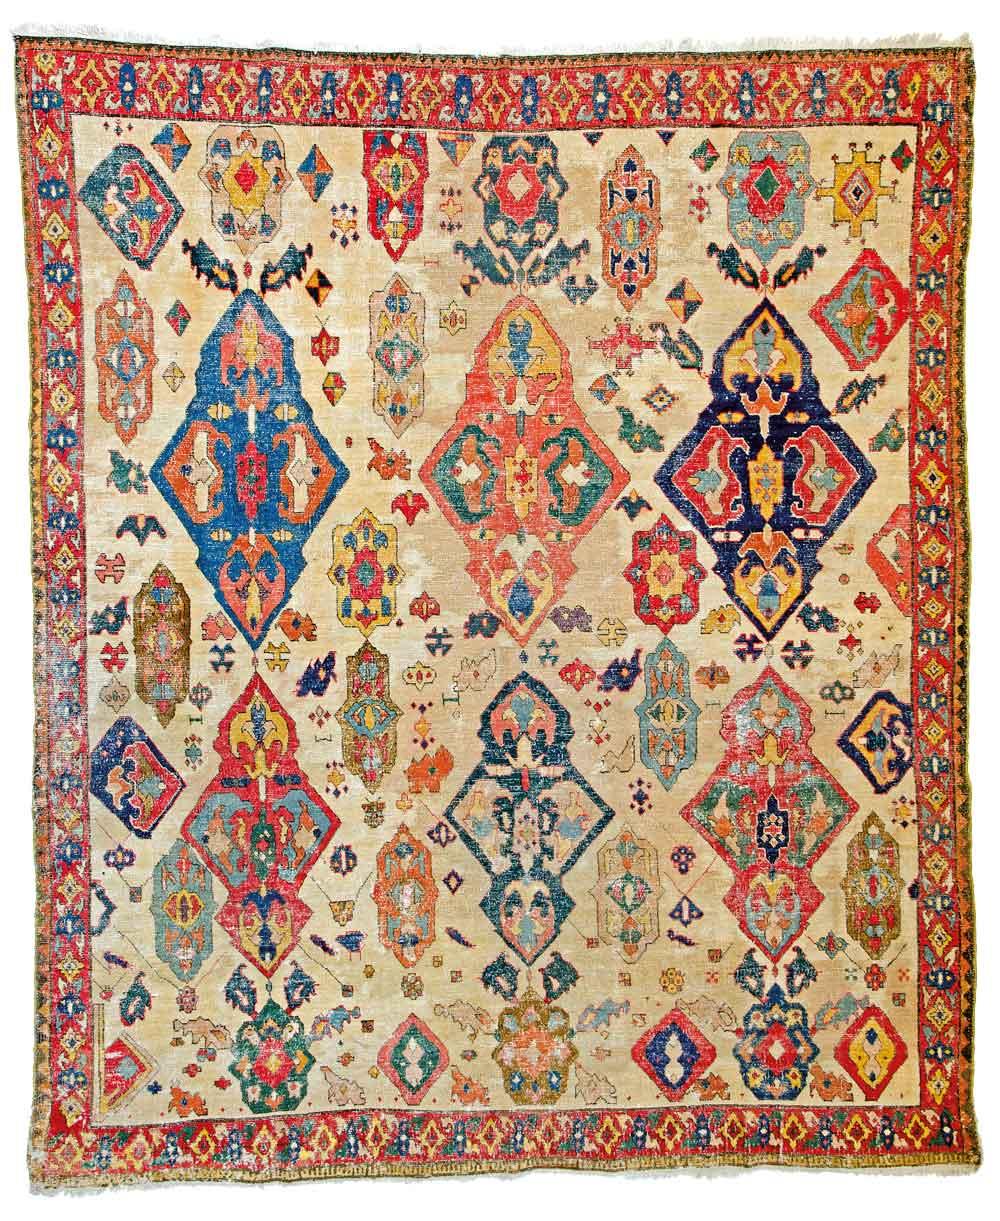 Fine Antique Oriental Rugs II, Austria Auction Company